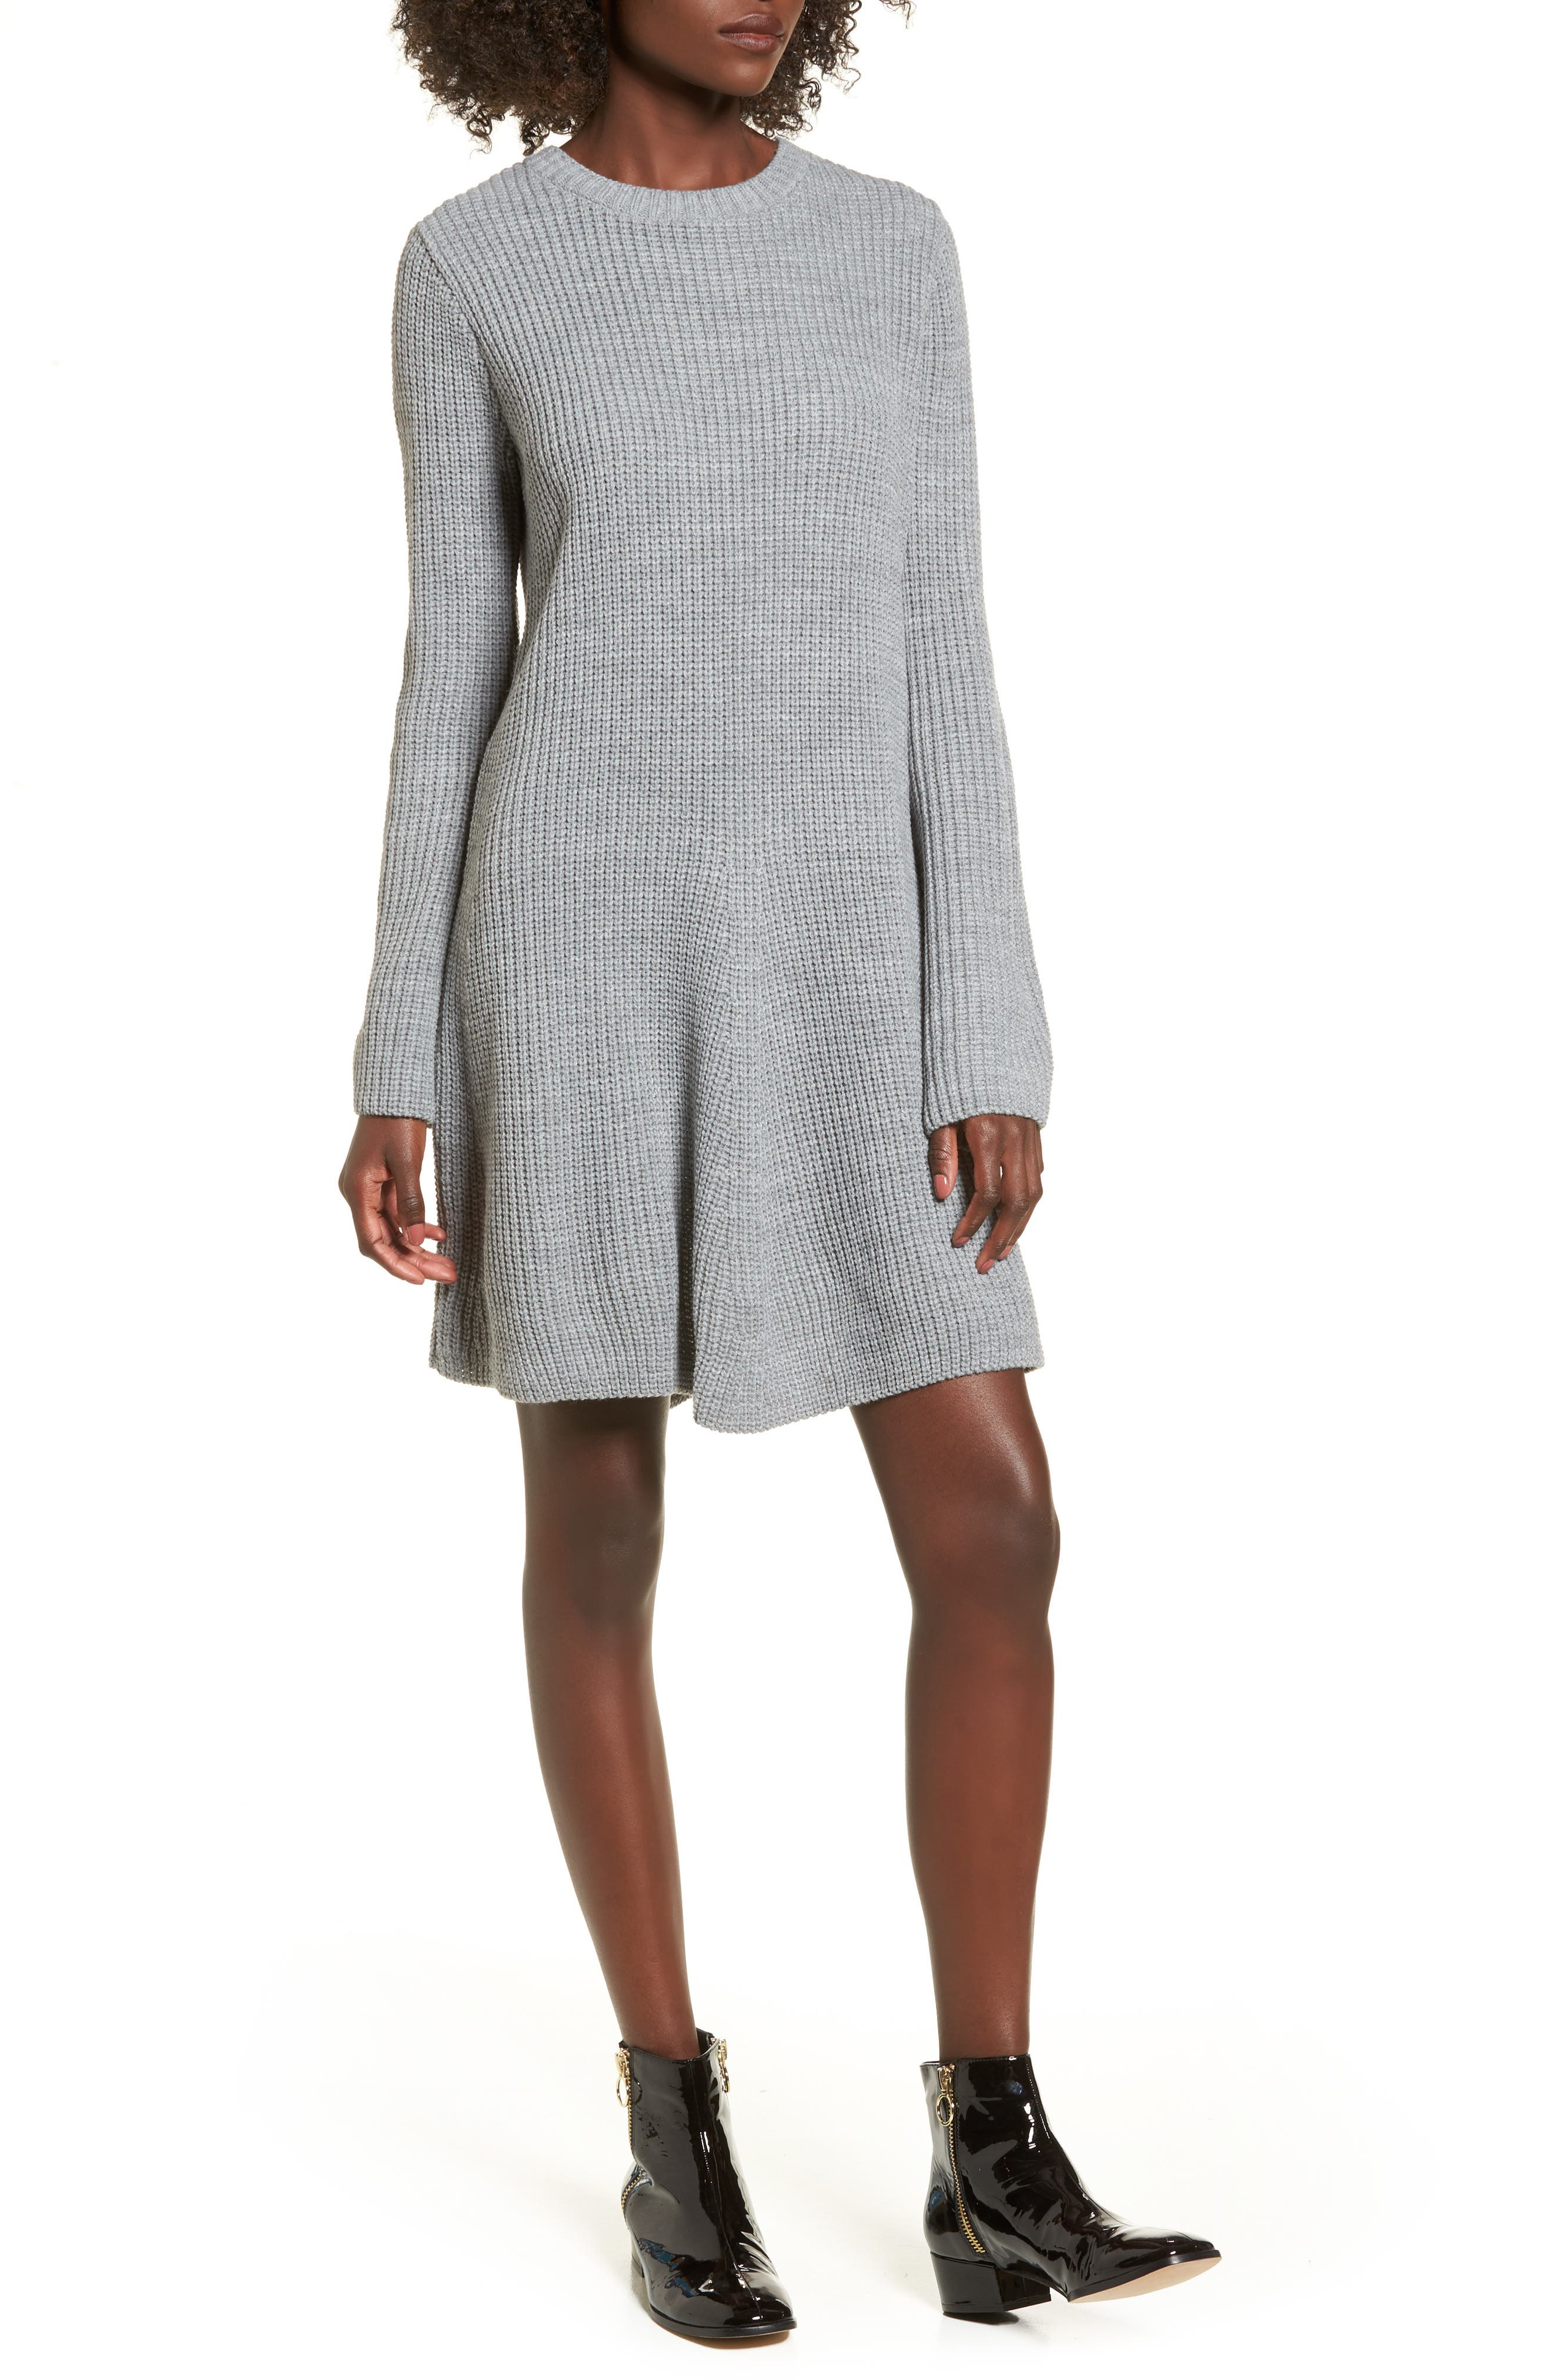 Alternate Image 1 Selected - Cotton Emporium Flared Sleeve Sweater Dress